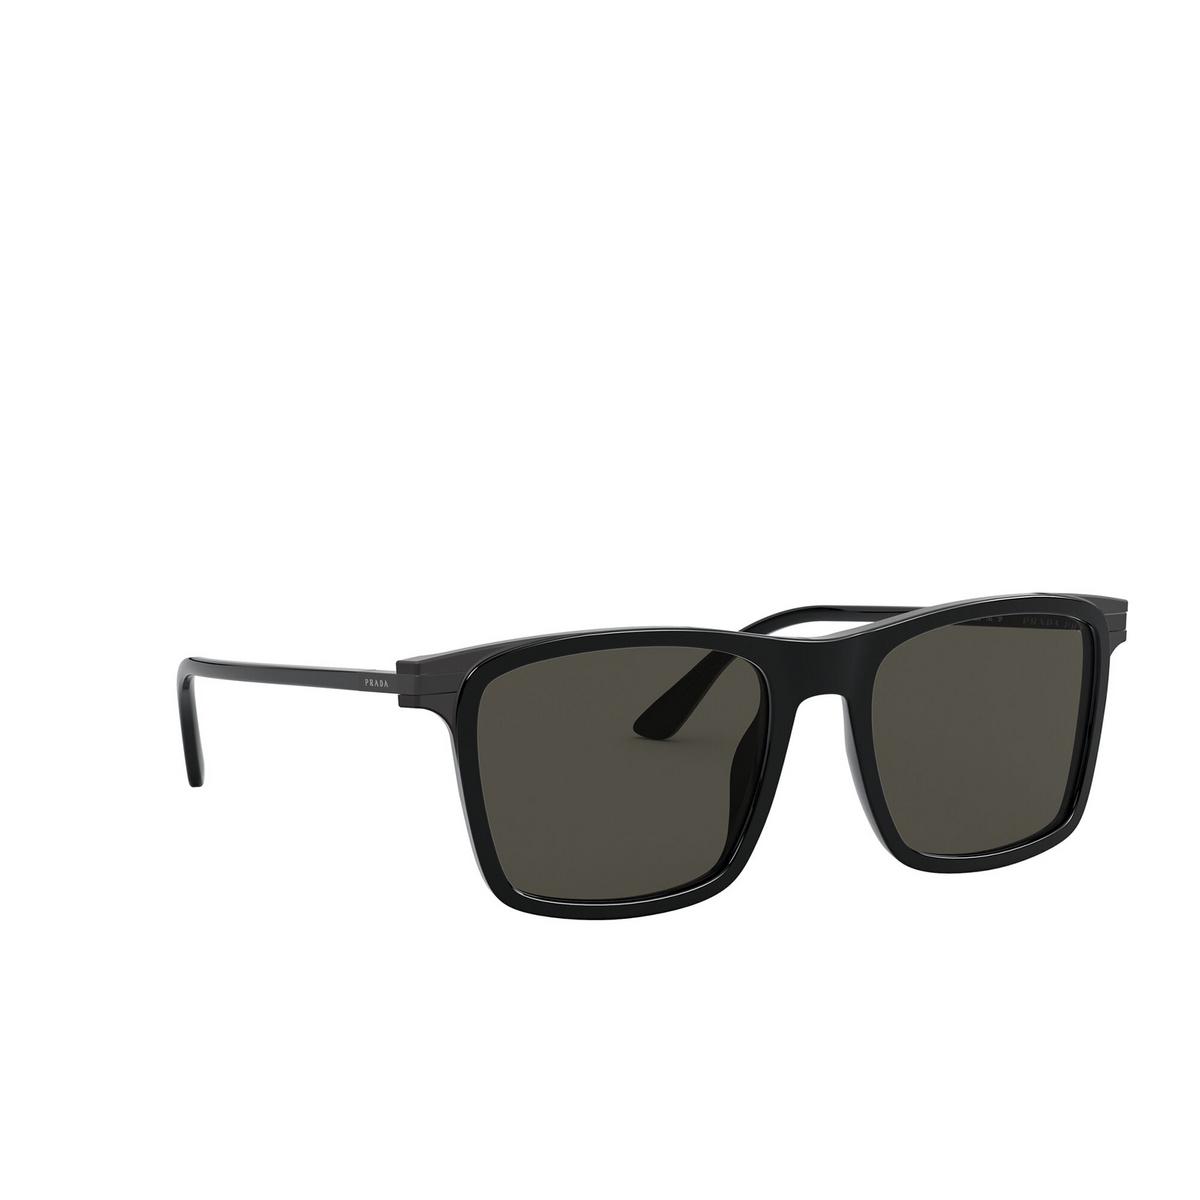 Prada® Square Sunglasses: PR 19XS color Black 07F08G - three-quarters view.